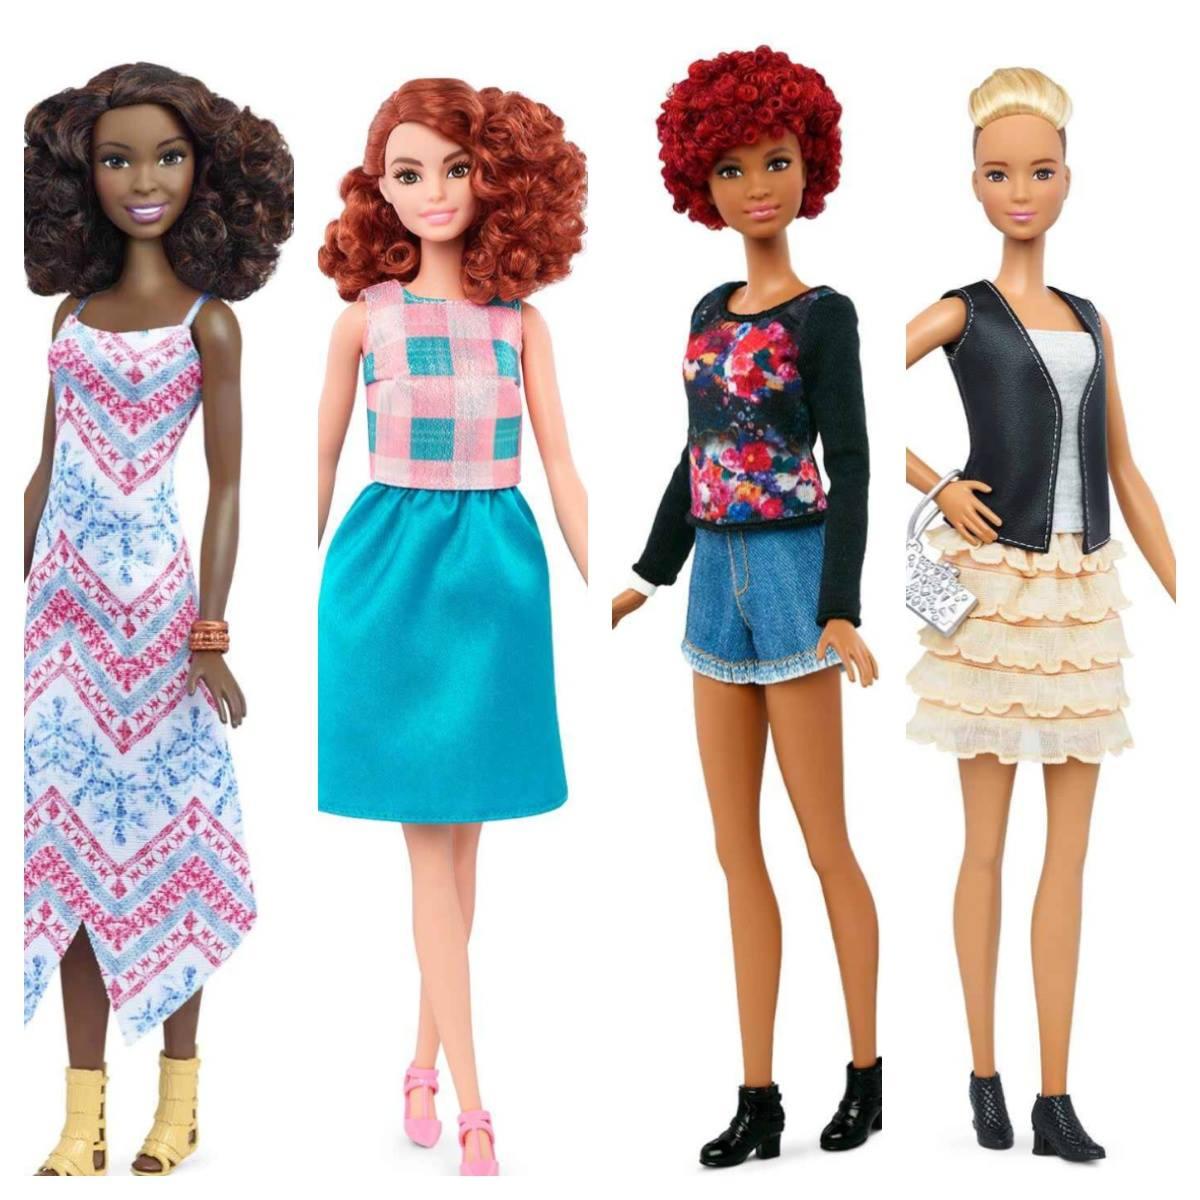 New Barbie Fashionista Dolls A Makeover For Barbie